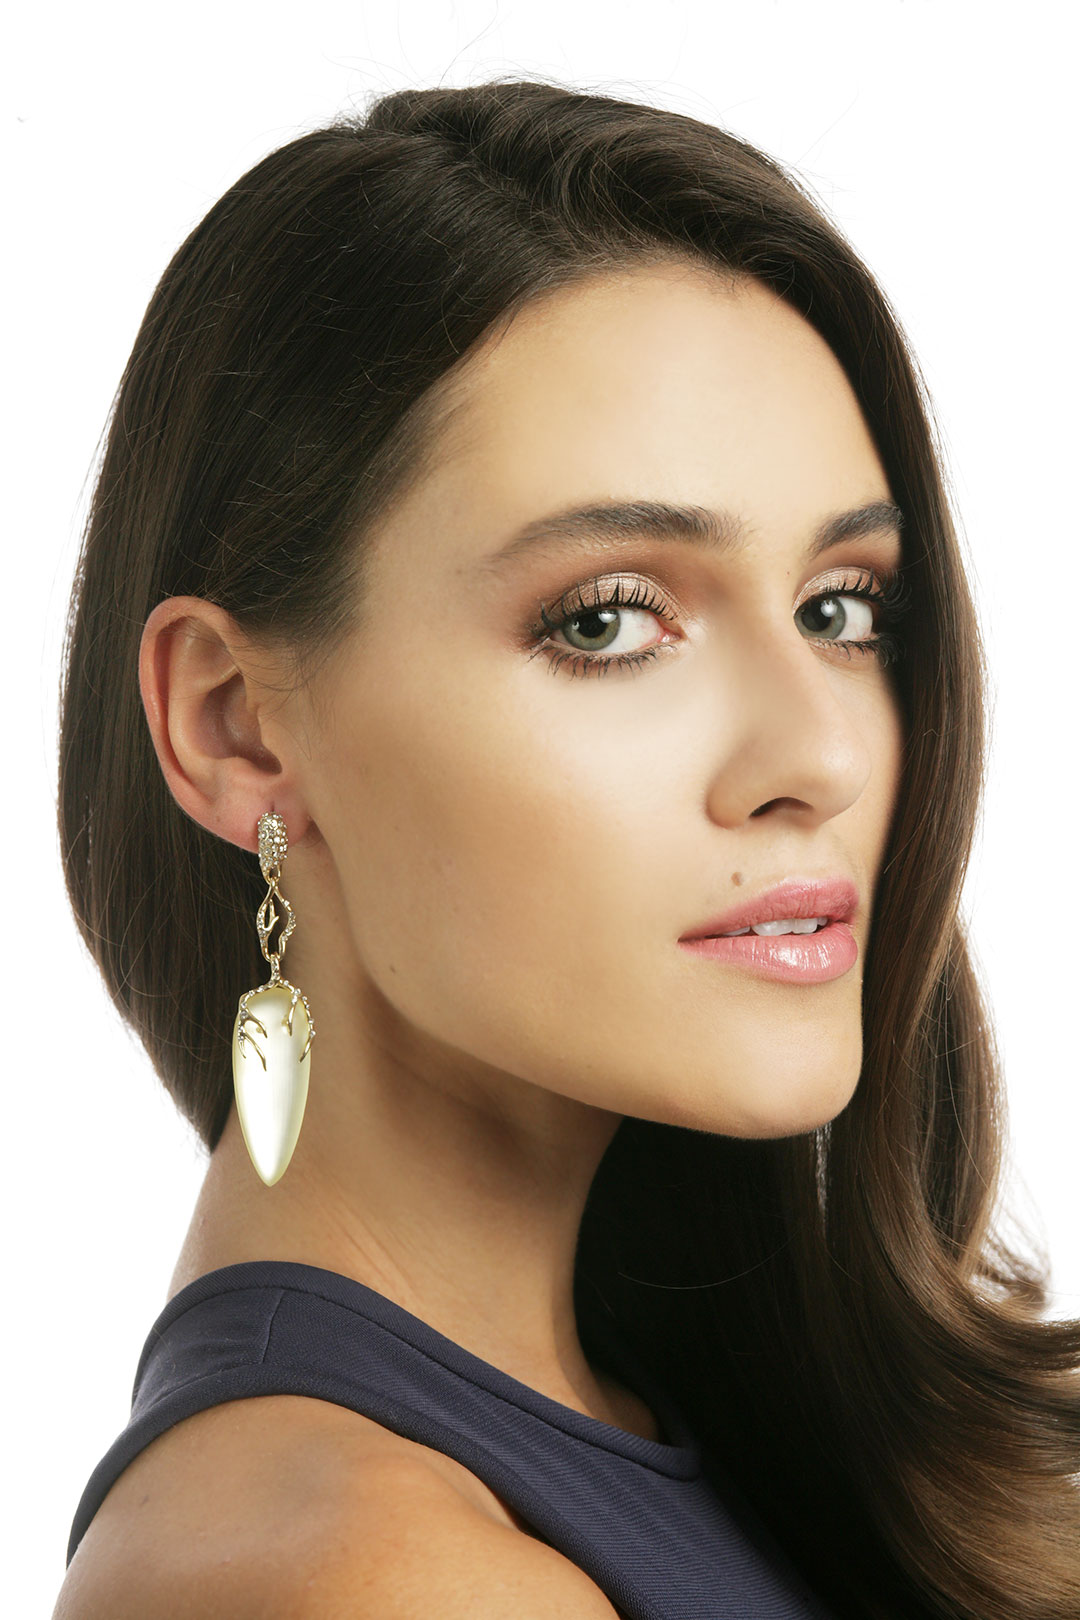 jewelry_earrings_alexis_bittar_lucite_talon_drops_over.jpg